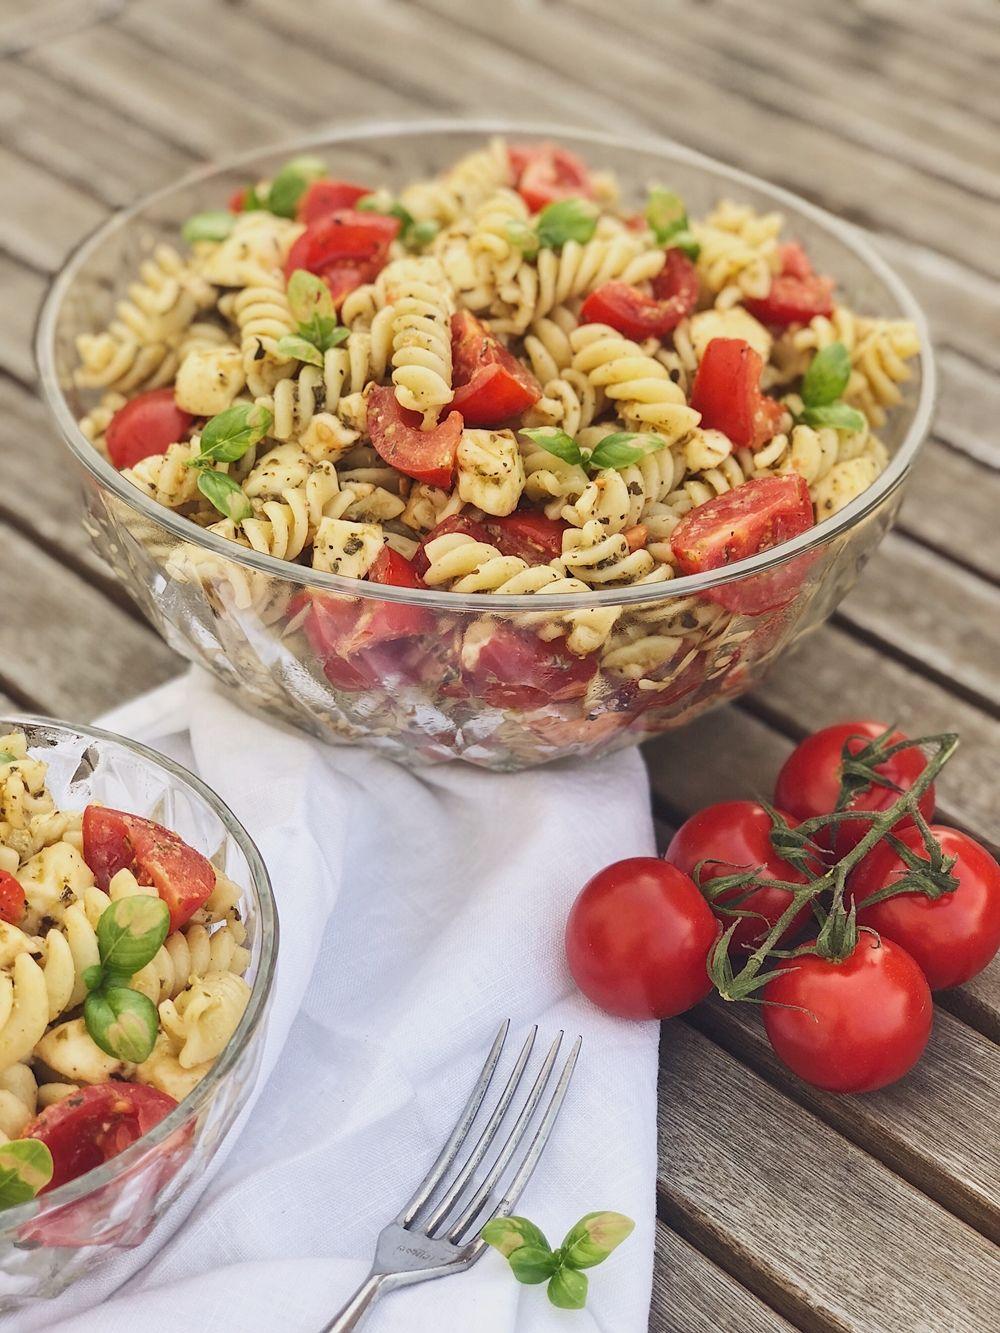 Photo of italienischer Pesto-Nudelsalat mit Tomaten und Mozzarella